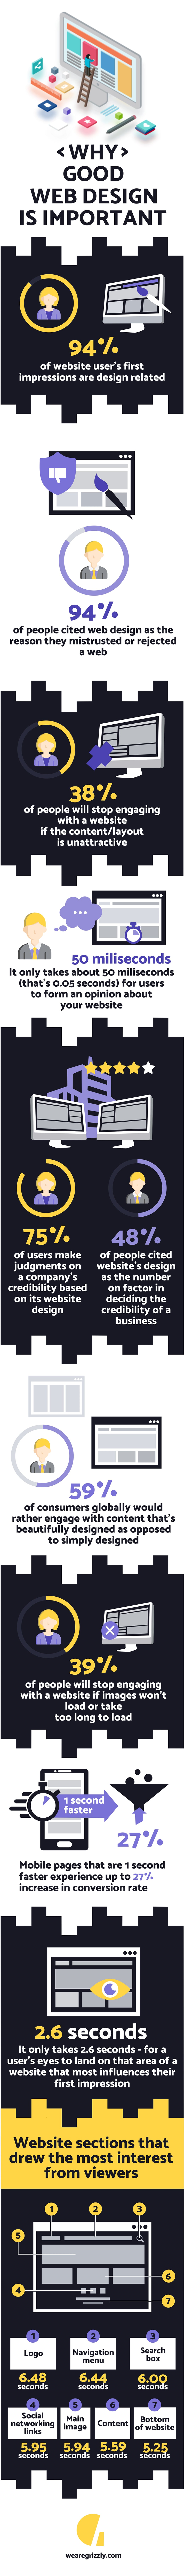 importance of web design inforgaphics